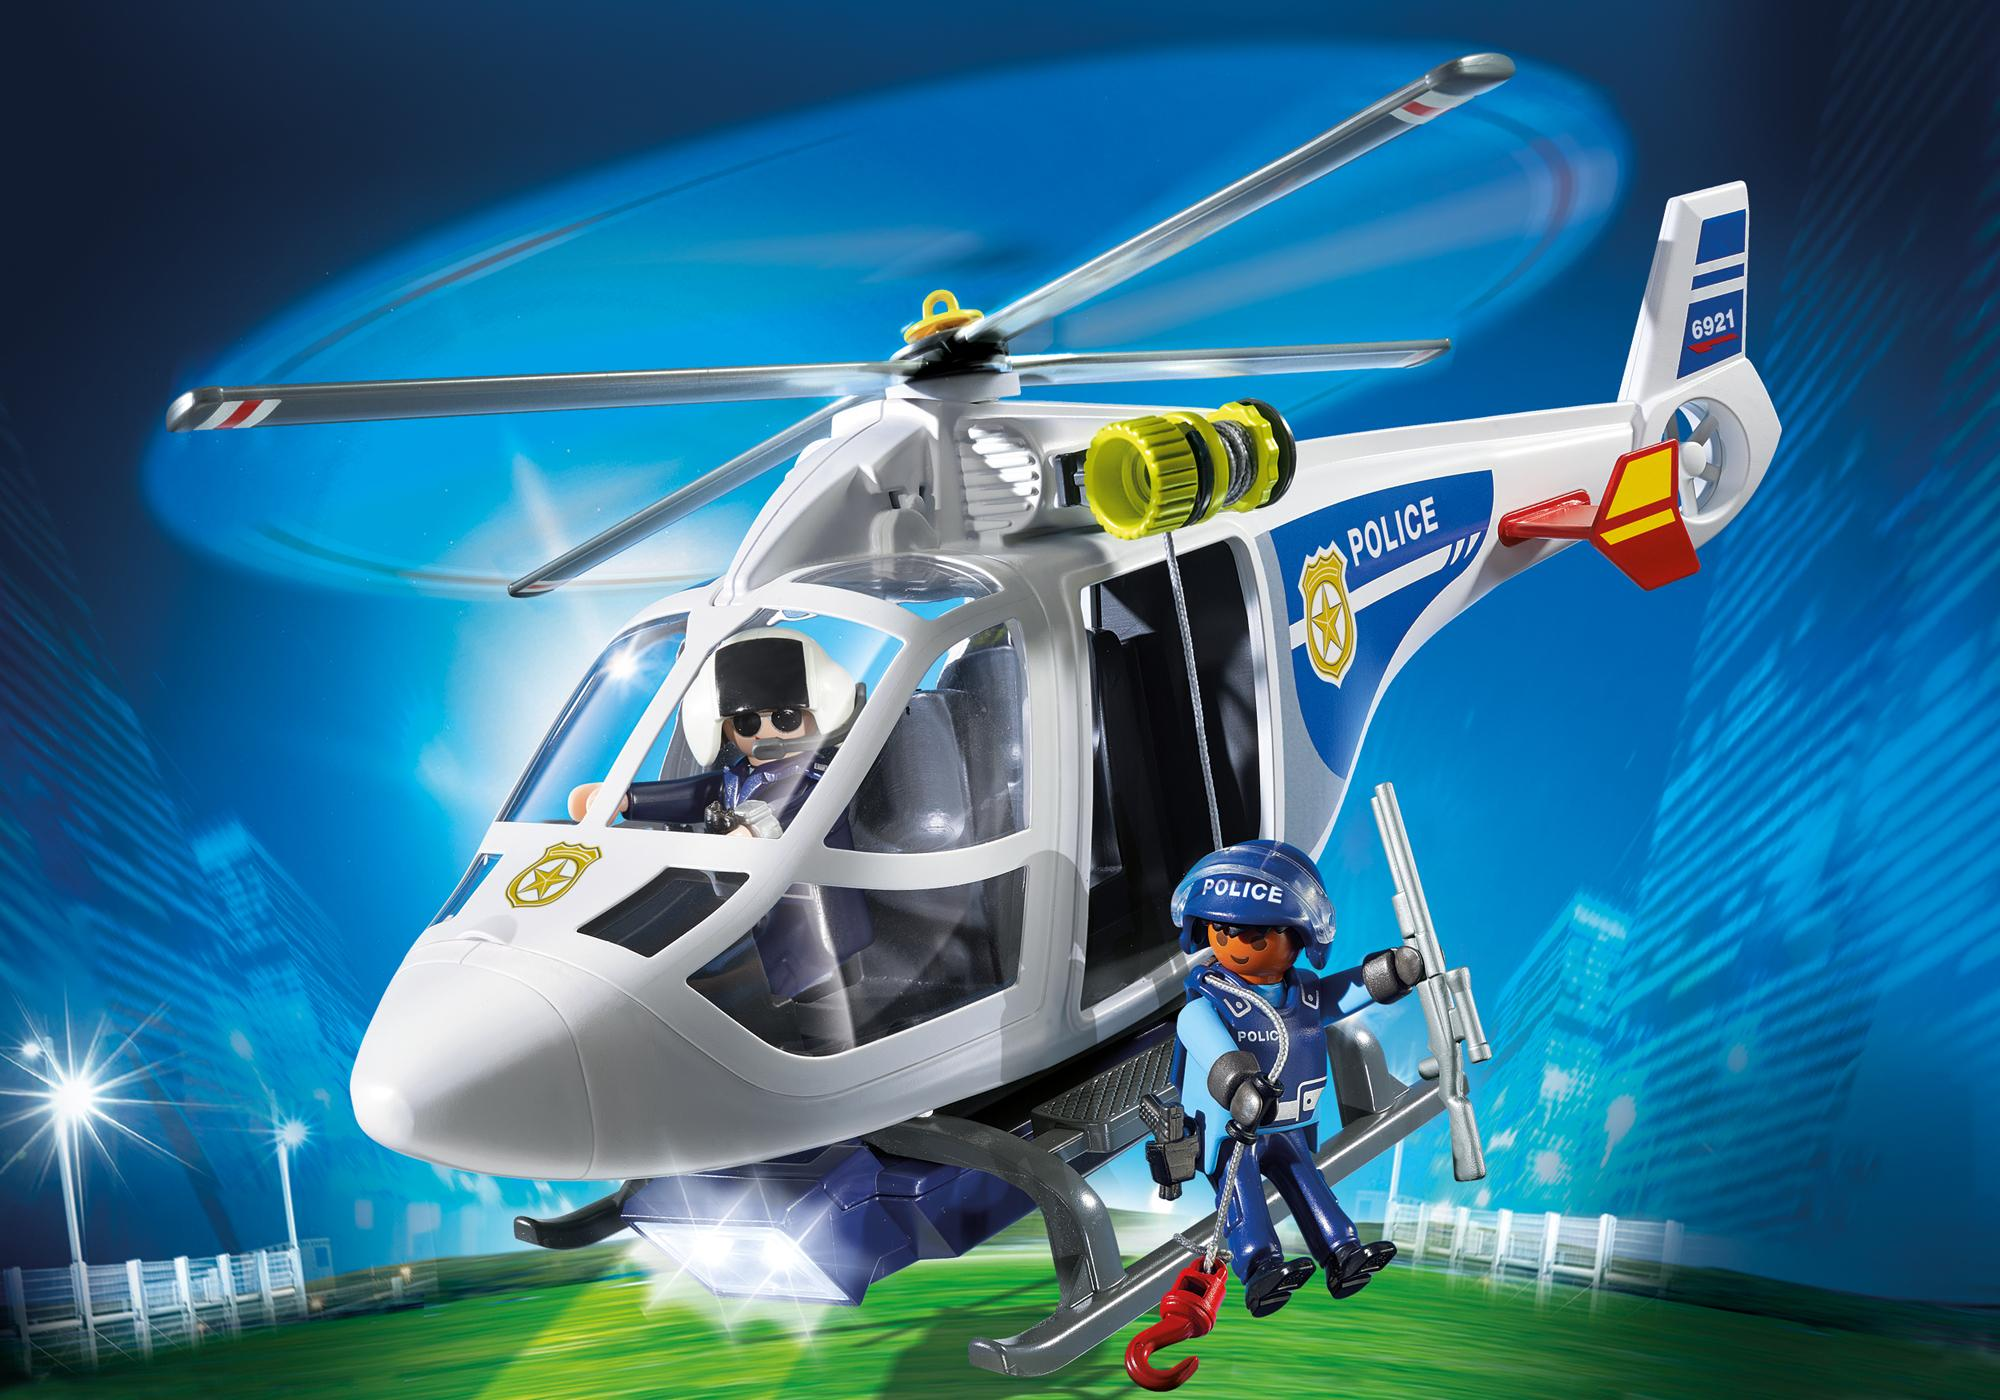 http://media.playmobil.com/i/playmobil/6921_product_detail/Politiehelikopter met LED-zoeklicht